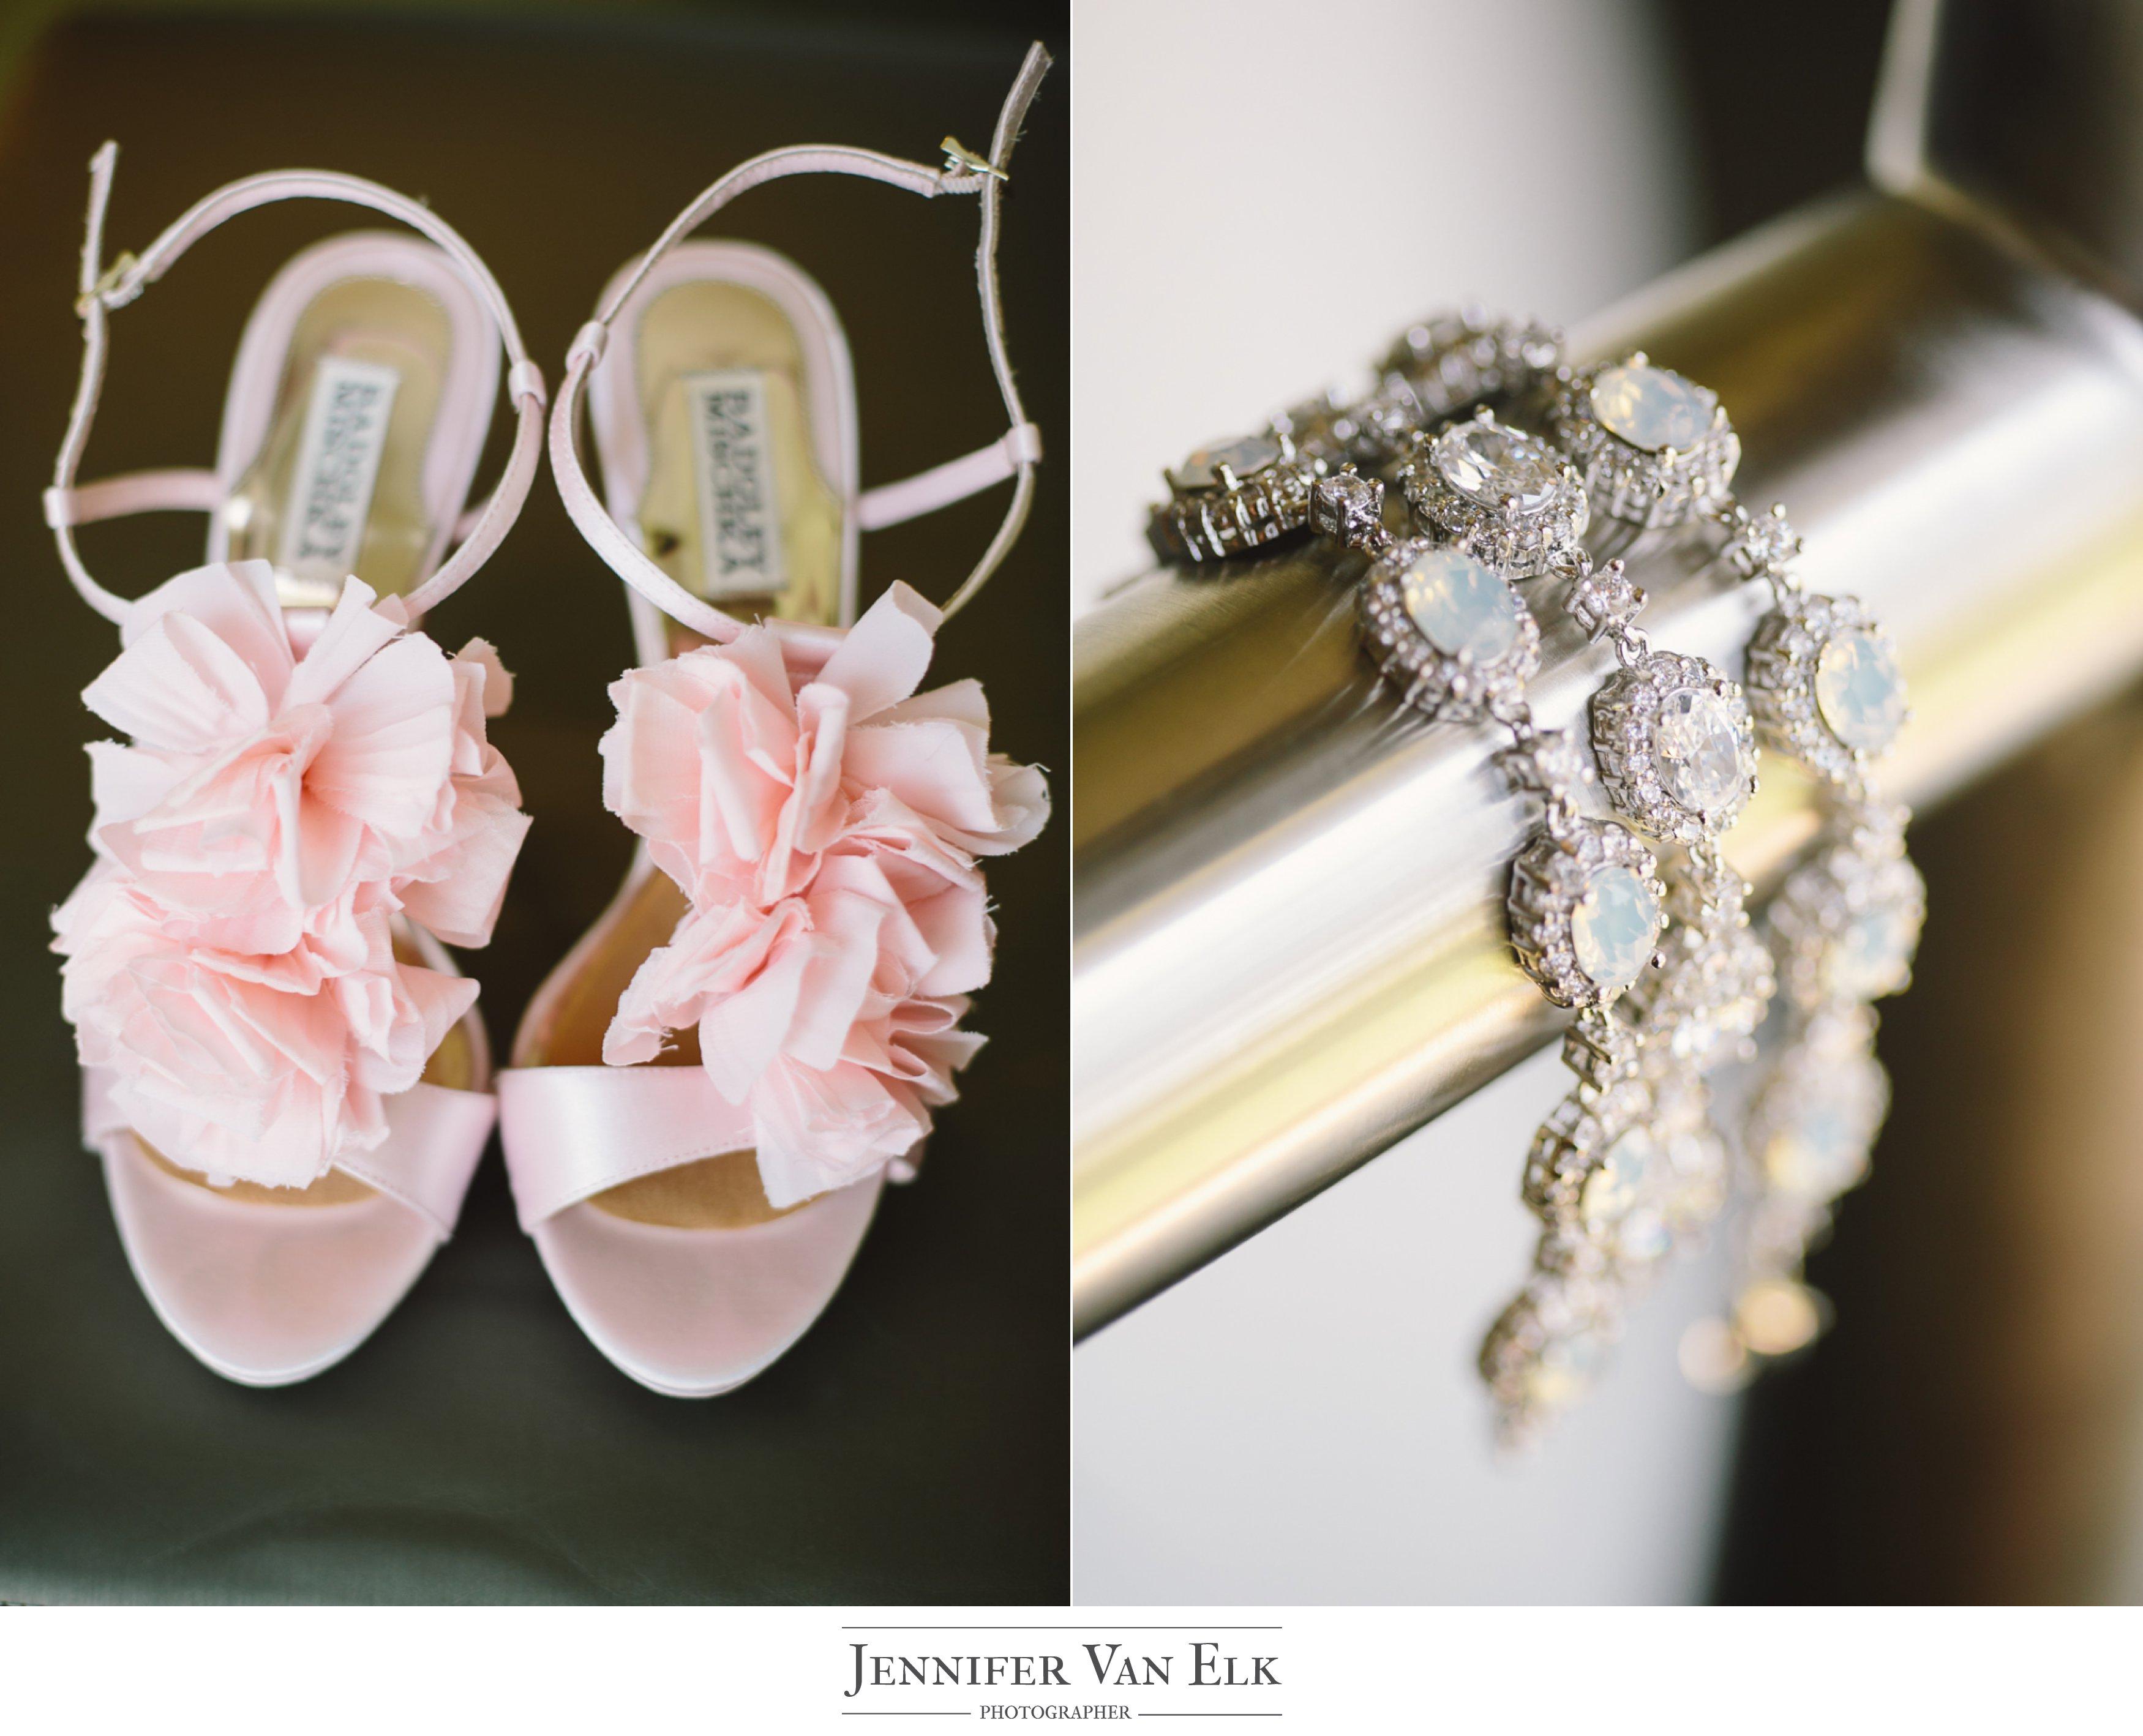 003 brides shoes and bracelet.jpg